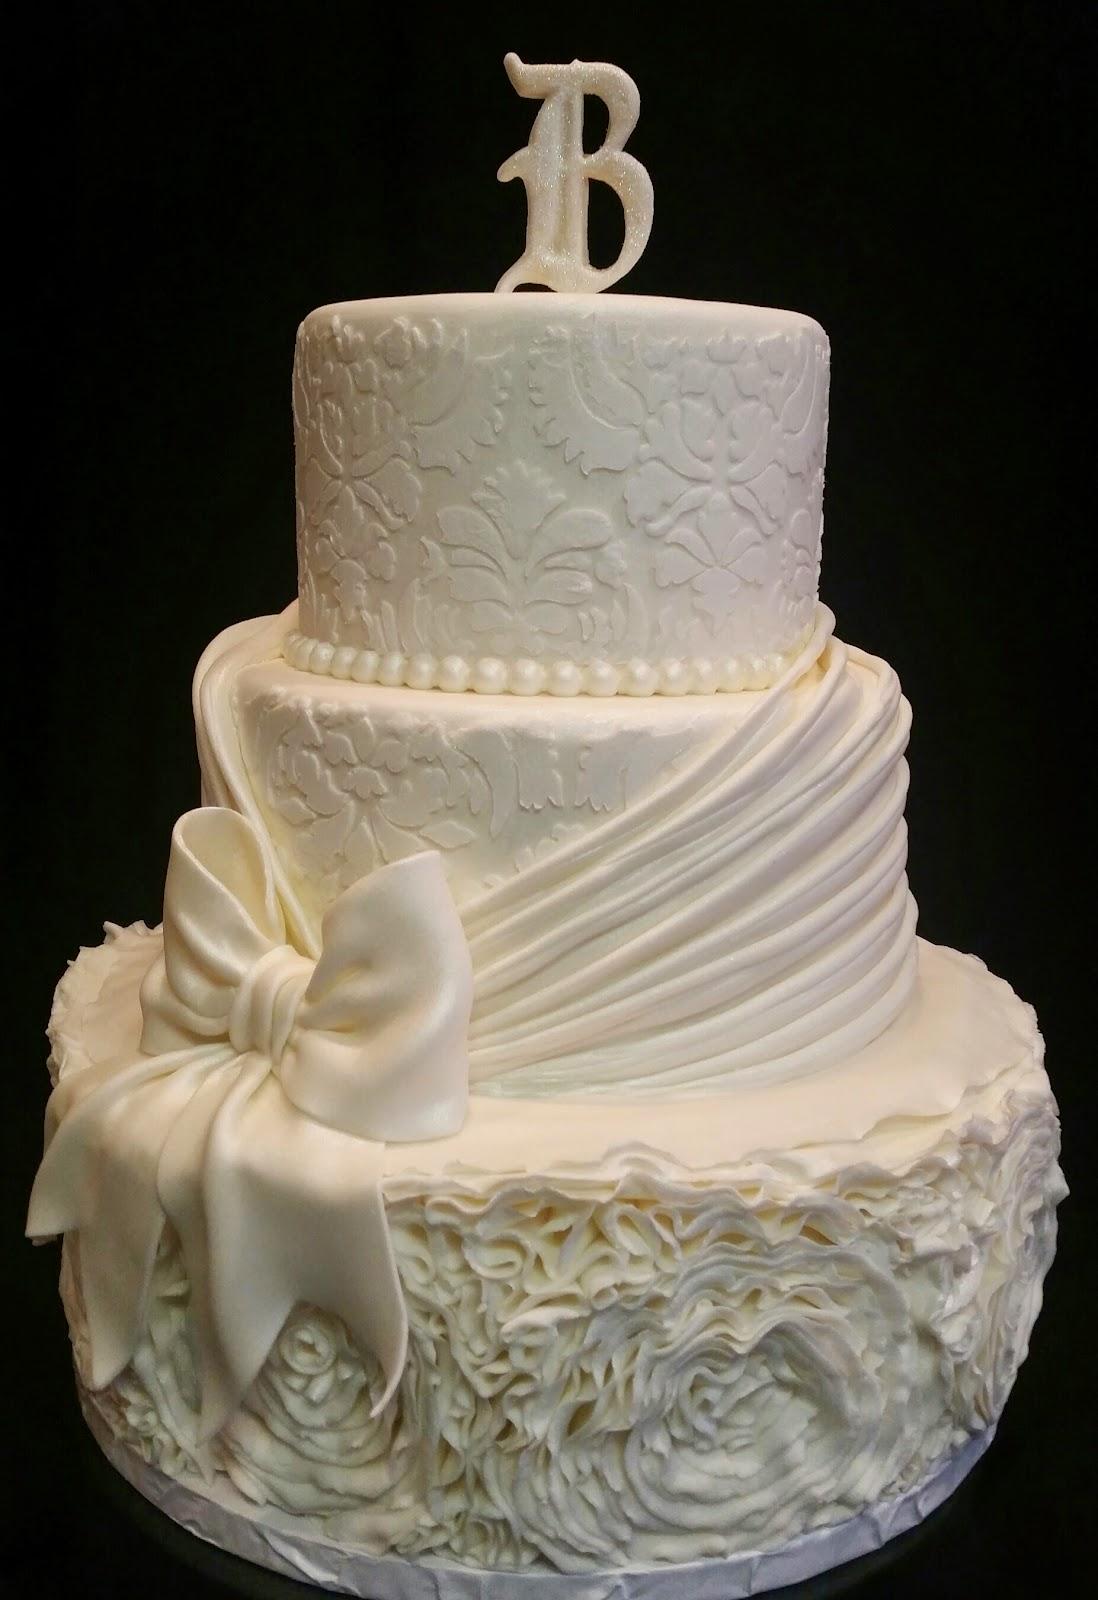 MyMoniCakes: 3 tiered wedding cake design with ruching, ruffled ...